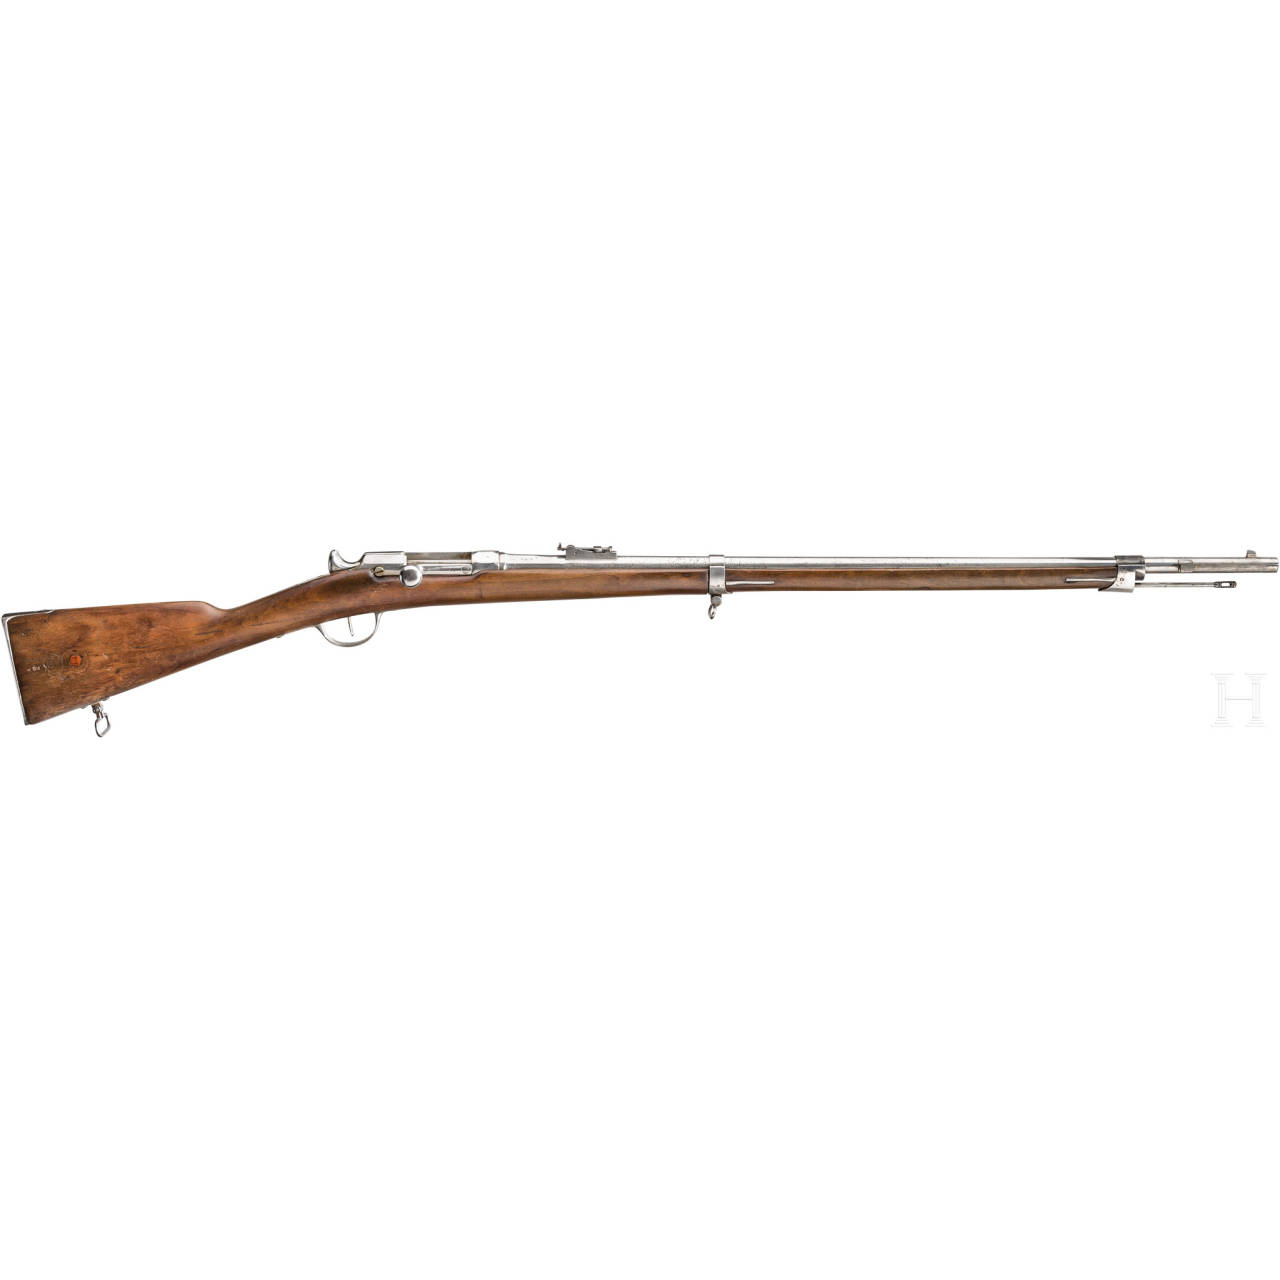 Zündnadelgewehr Chassepot M 1866